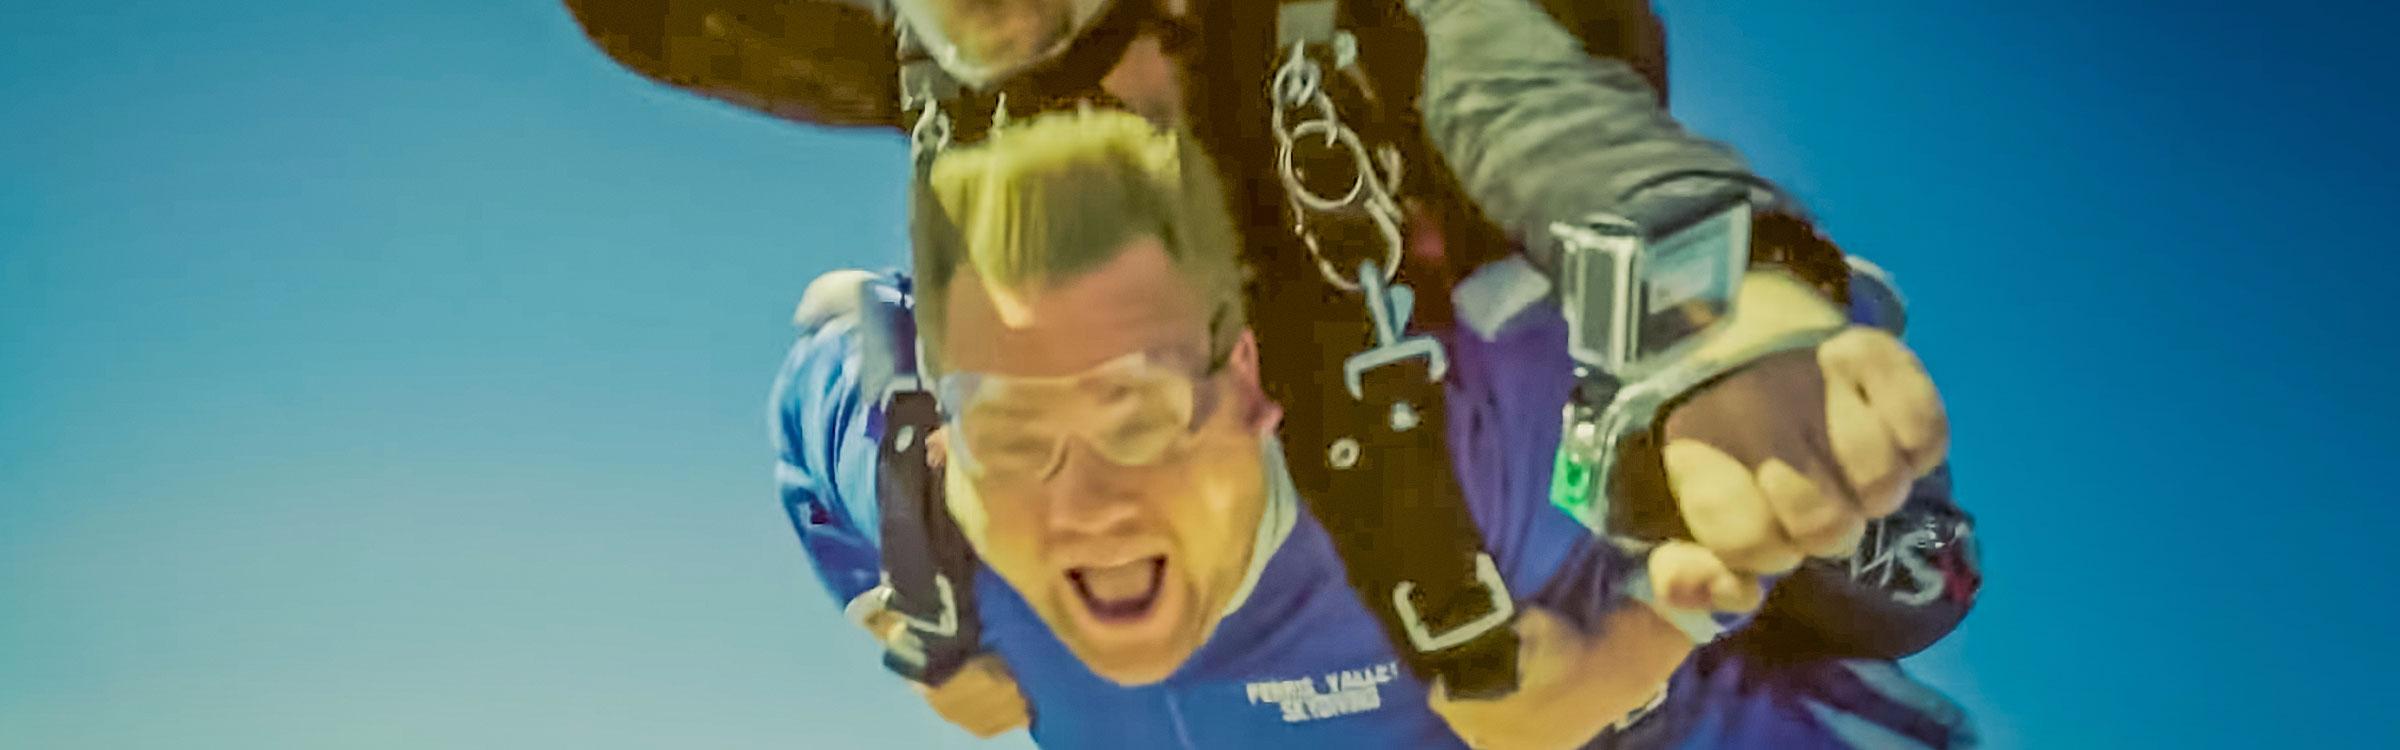 Skydiveheader